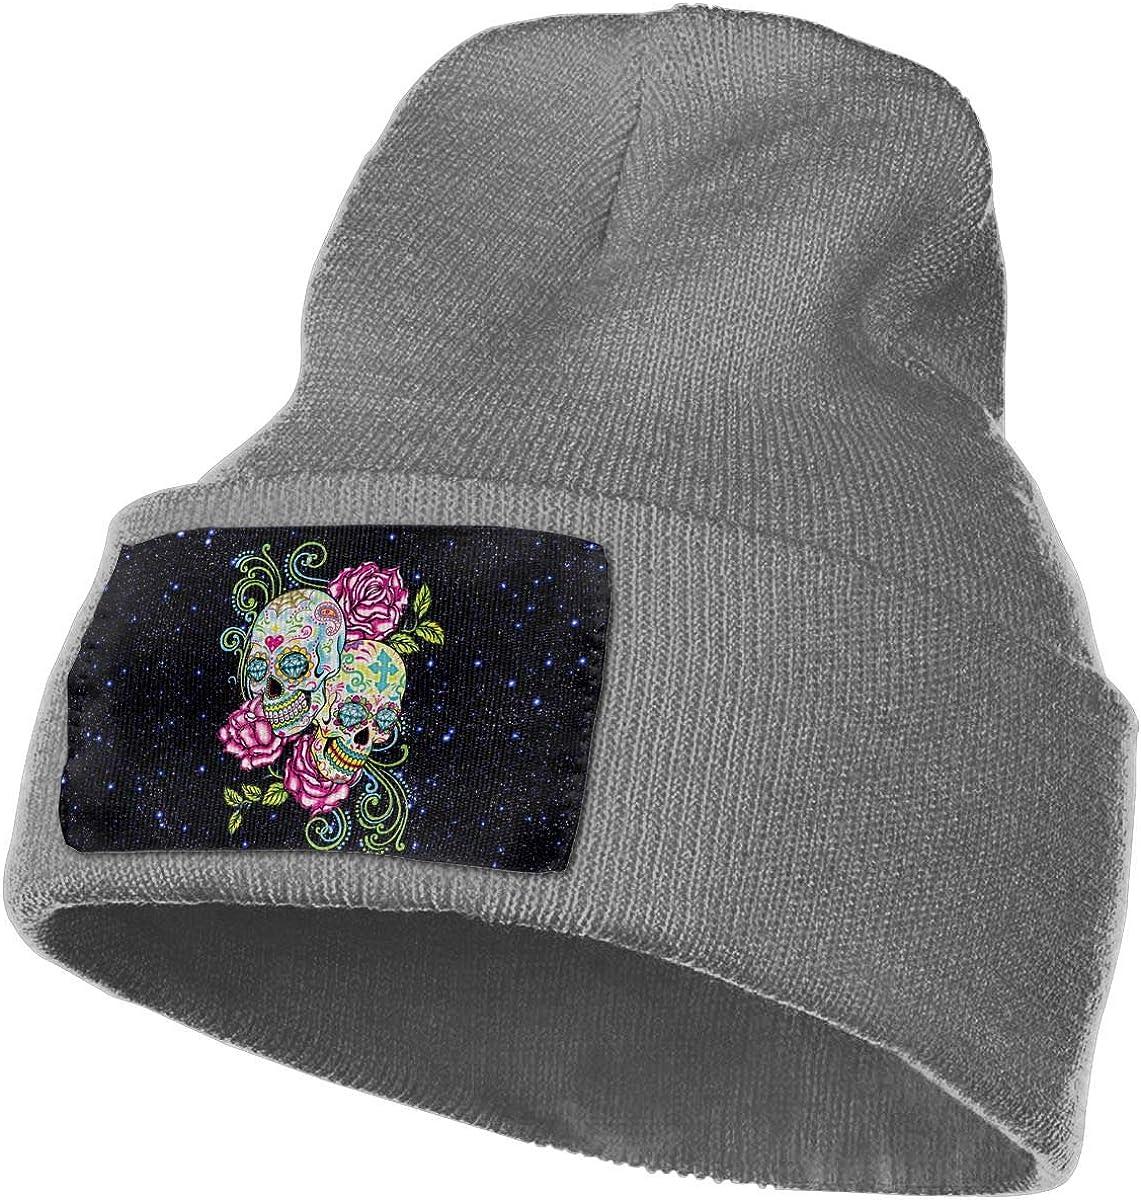 Sugar Skulls Unisex 3D Knitted Hat Skull Hat Beanie Cap